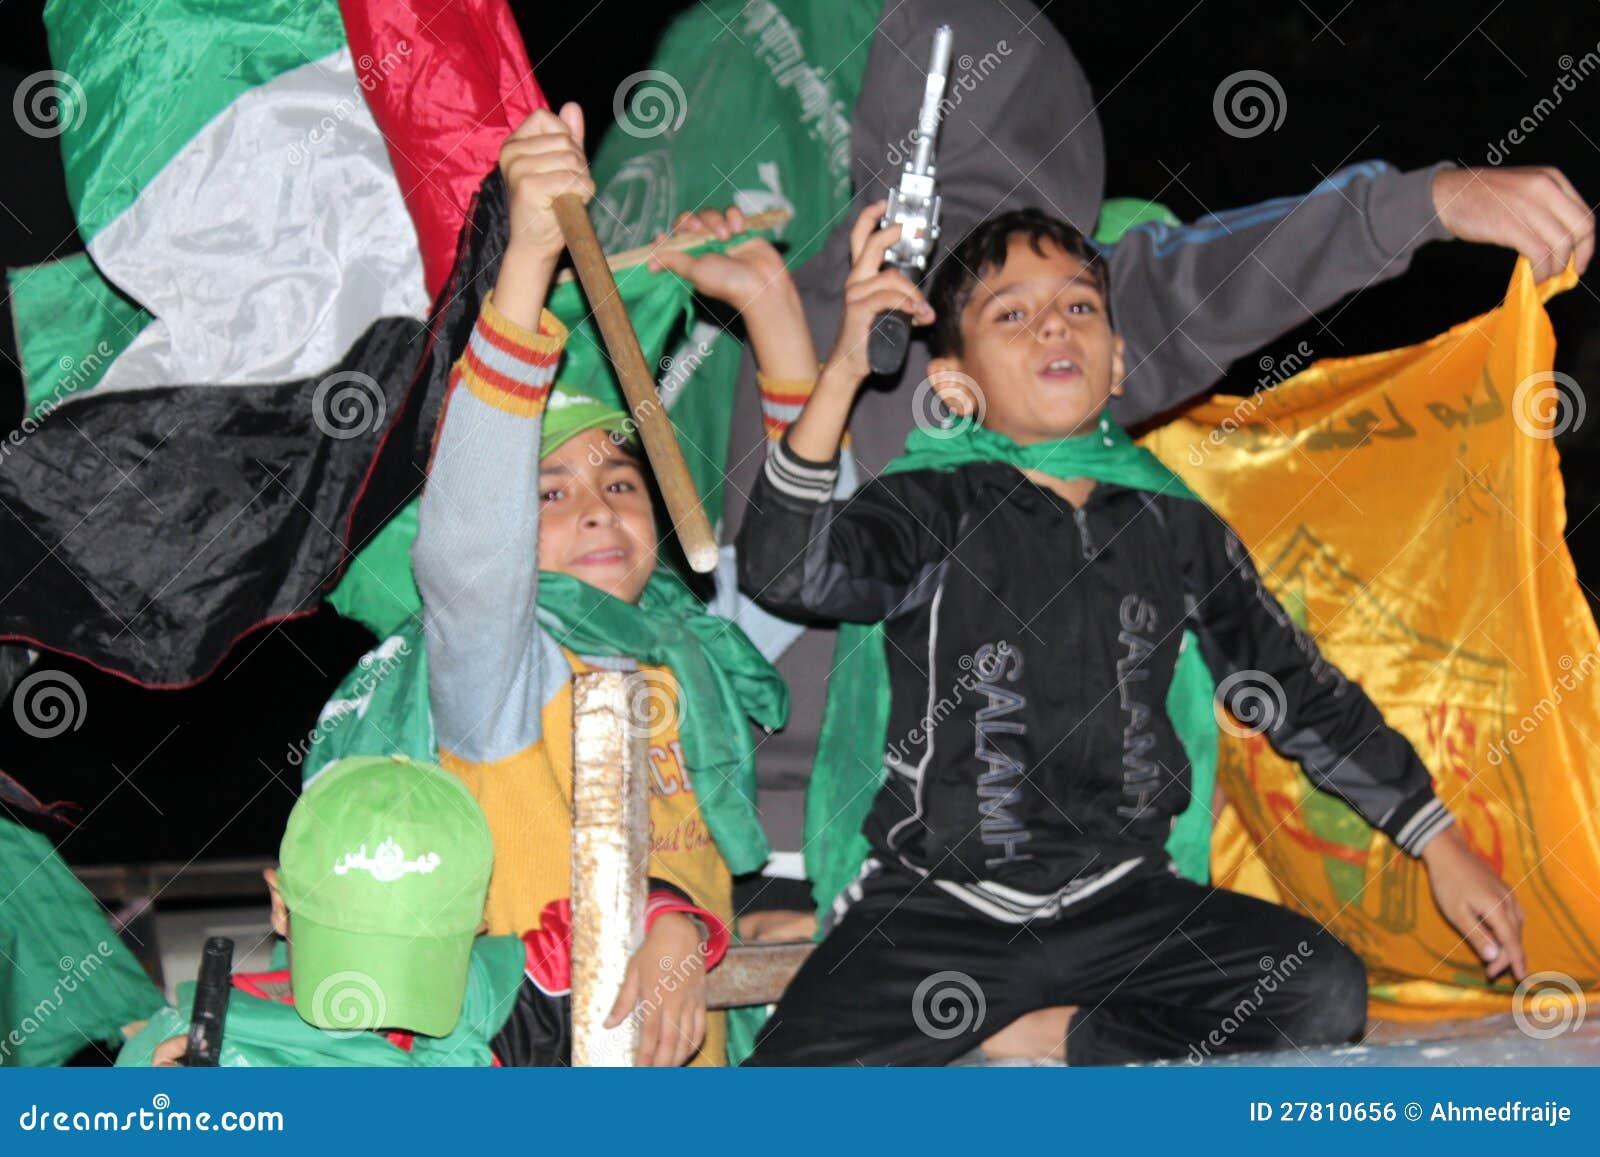 Segerberömmar i Gaza